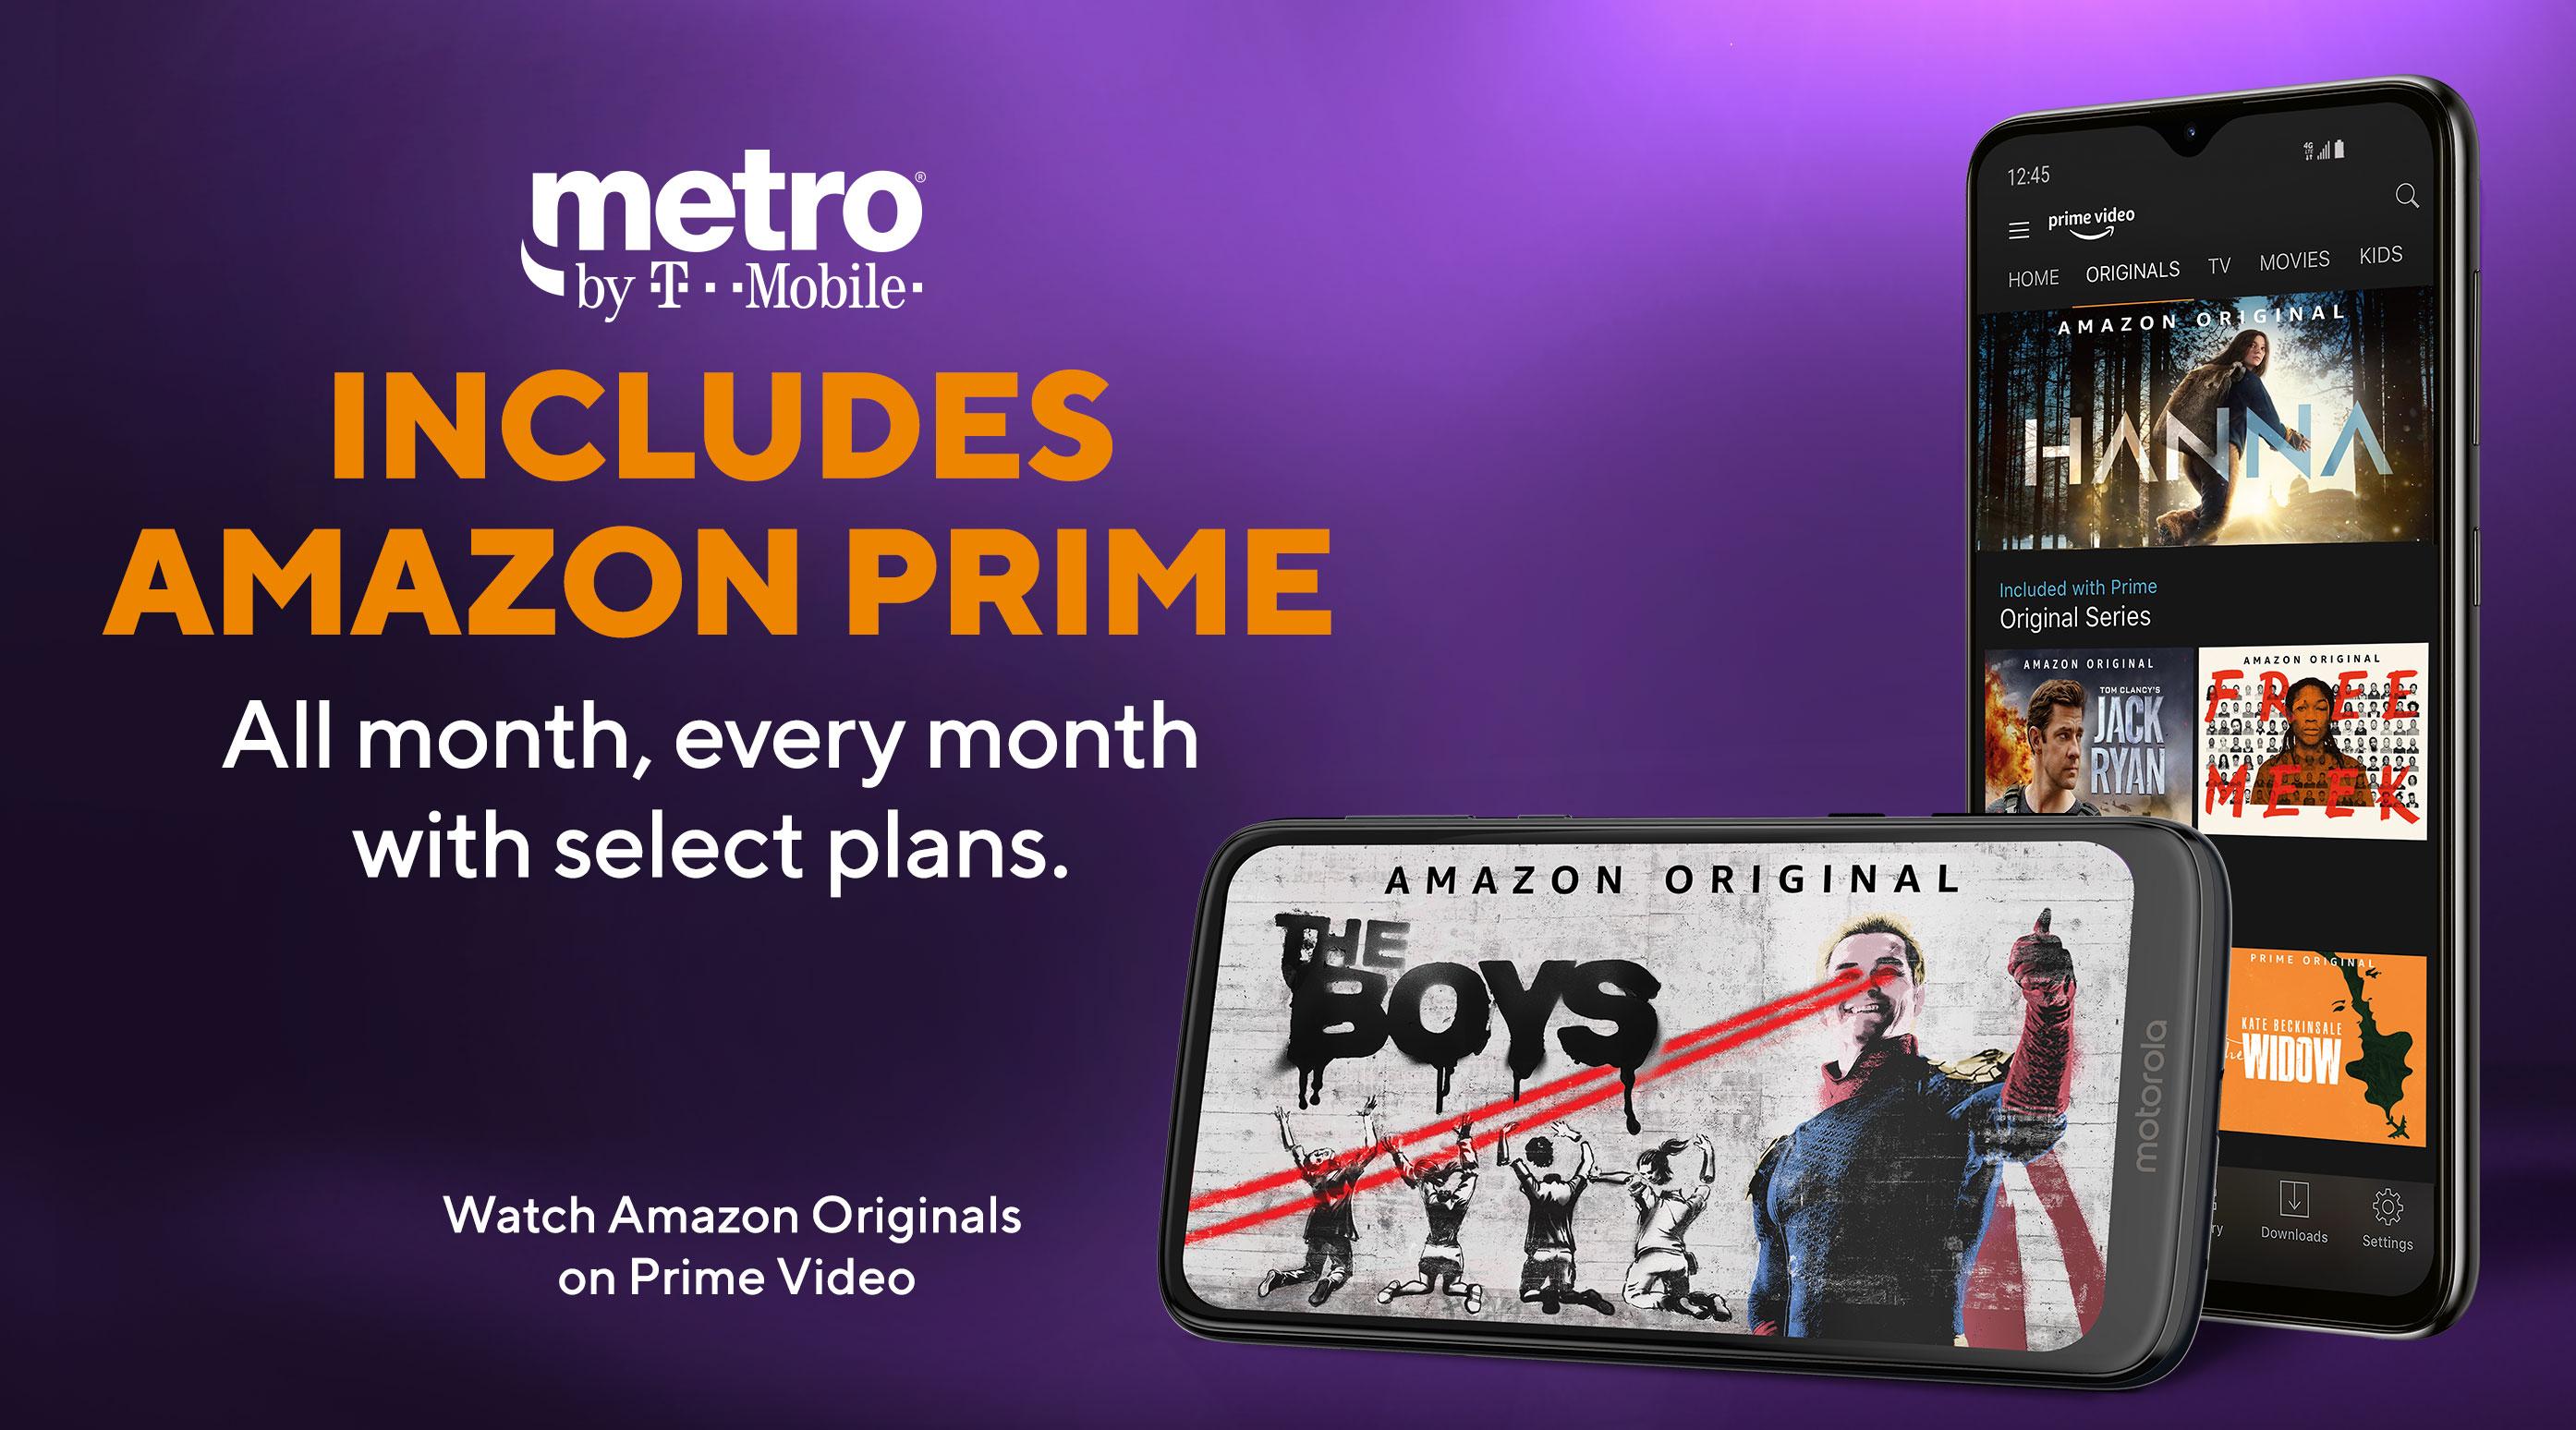 dessins attrayants rechercher le meilleur amazon Amazon Prime - Movies, Music & Free Shipping | Metro® by T ...